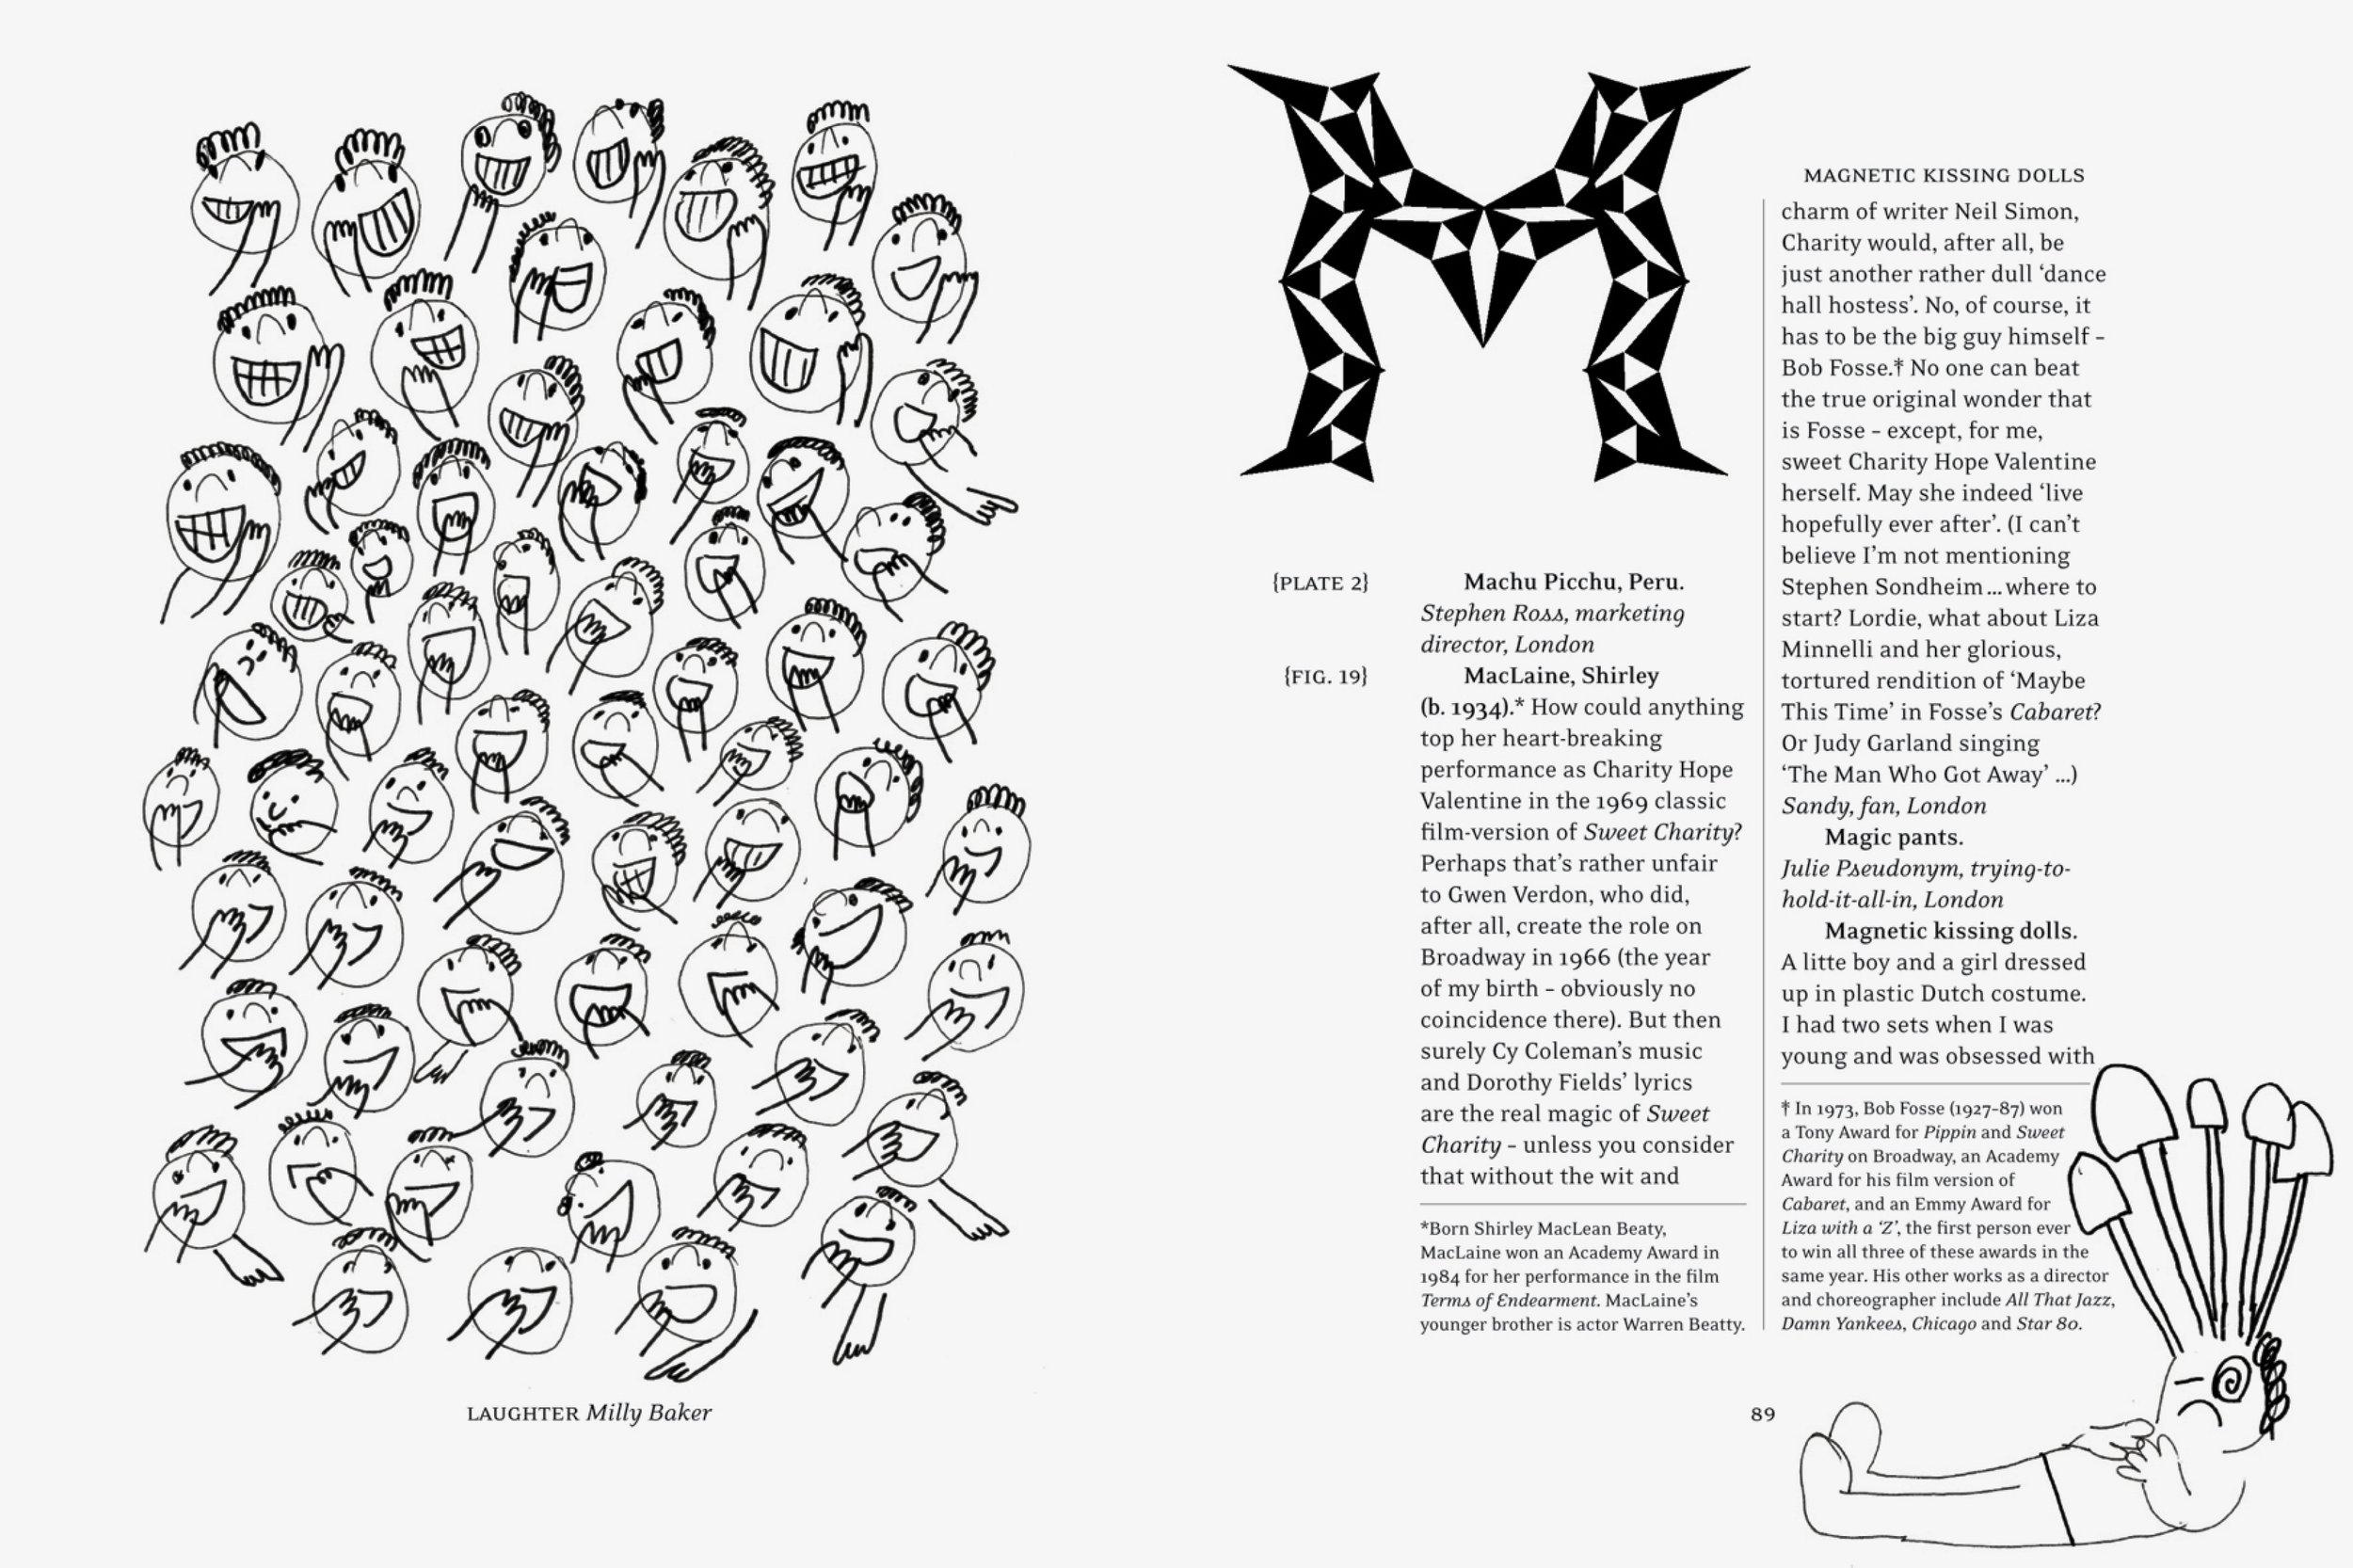 jane withers-logos5.jpg